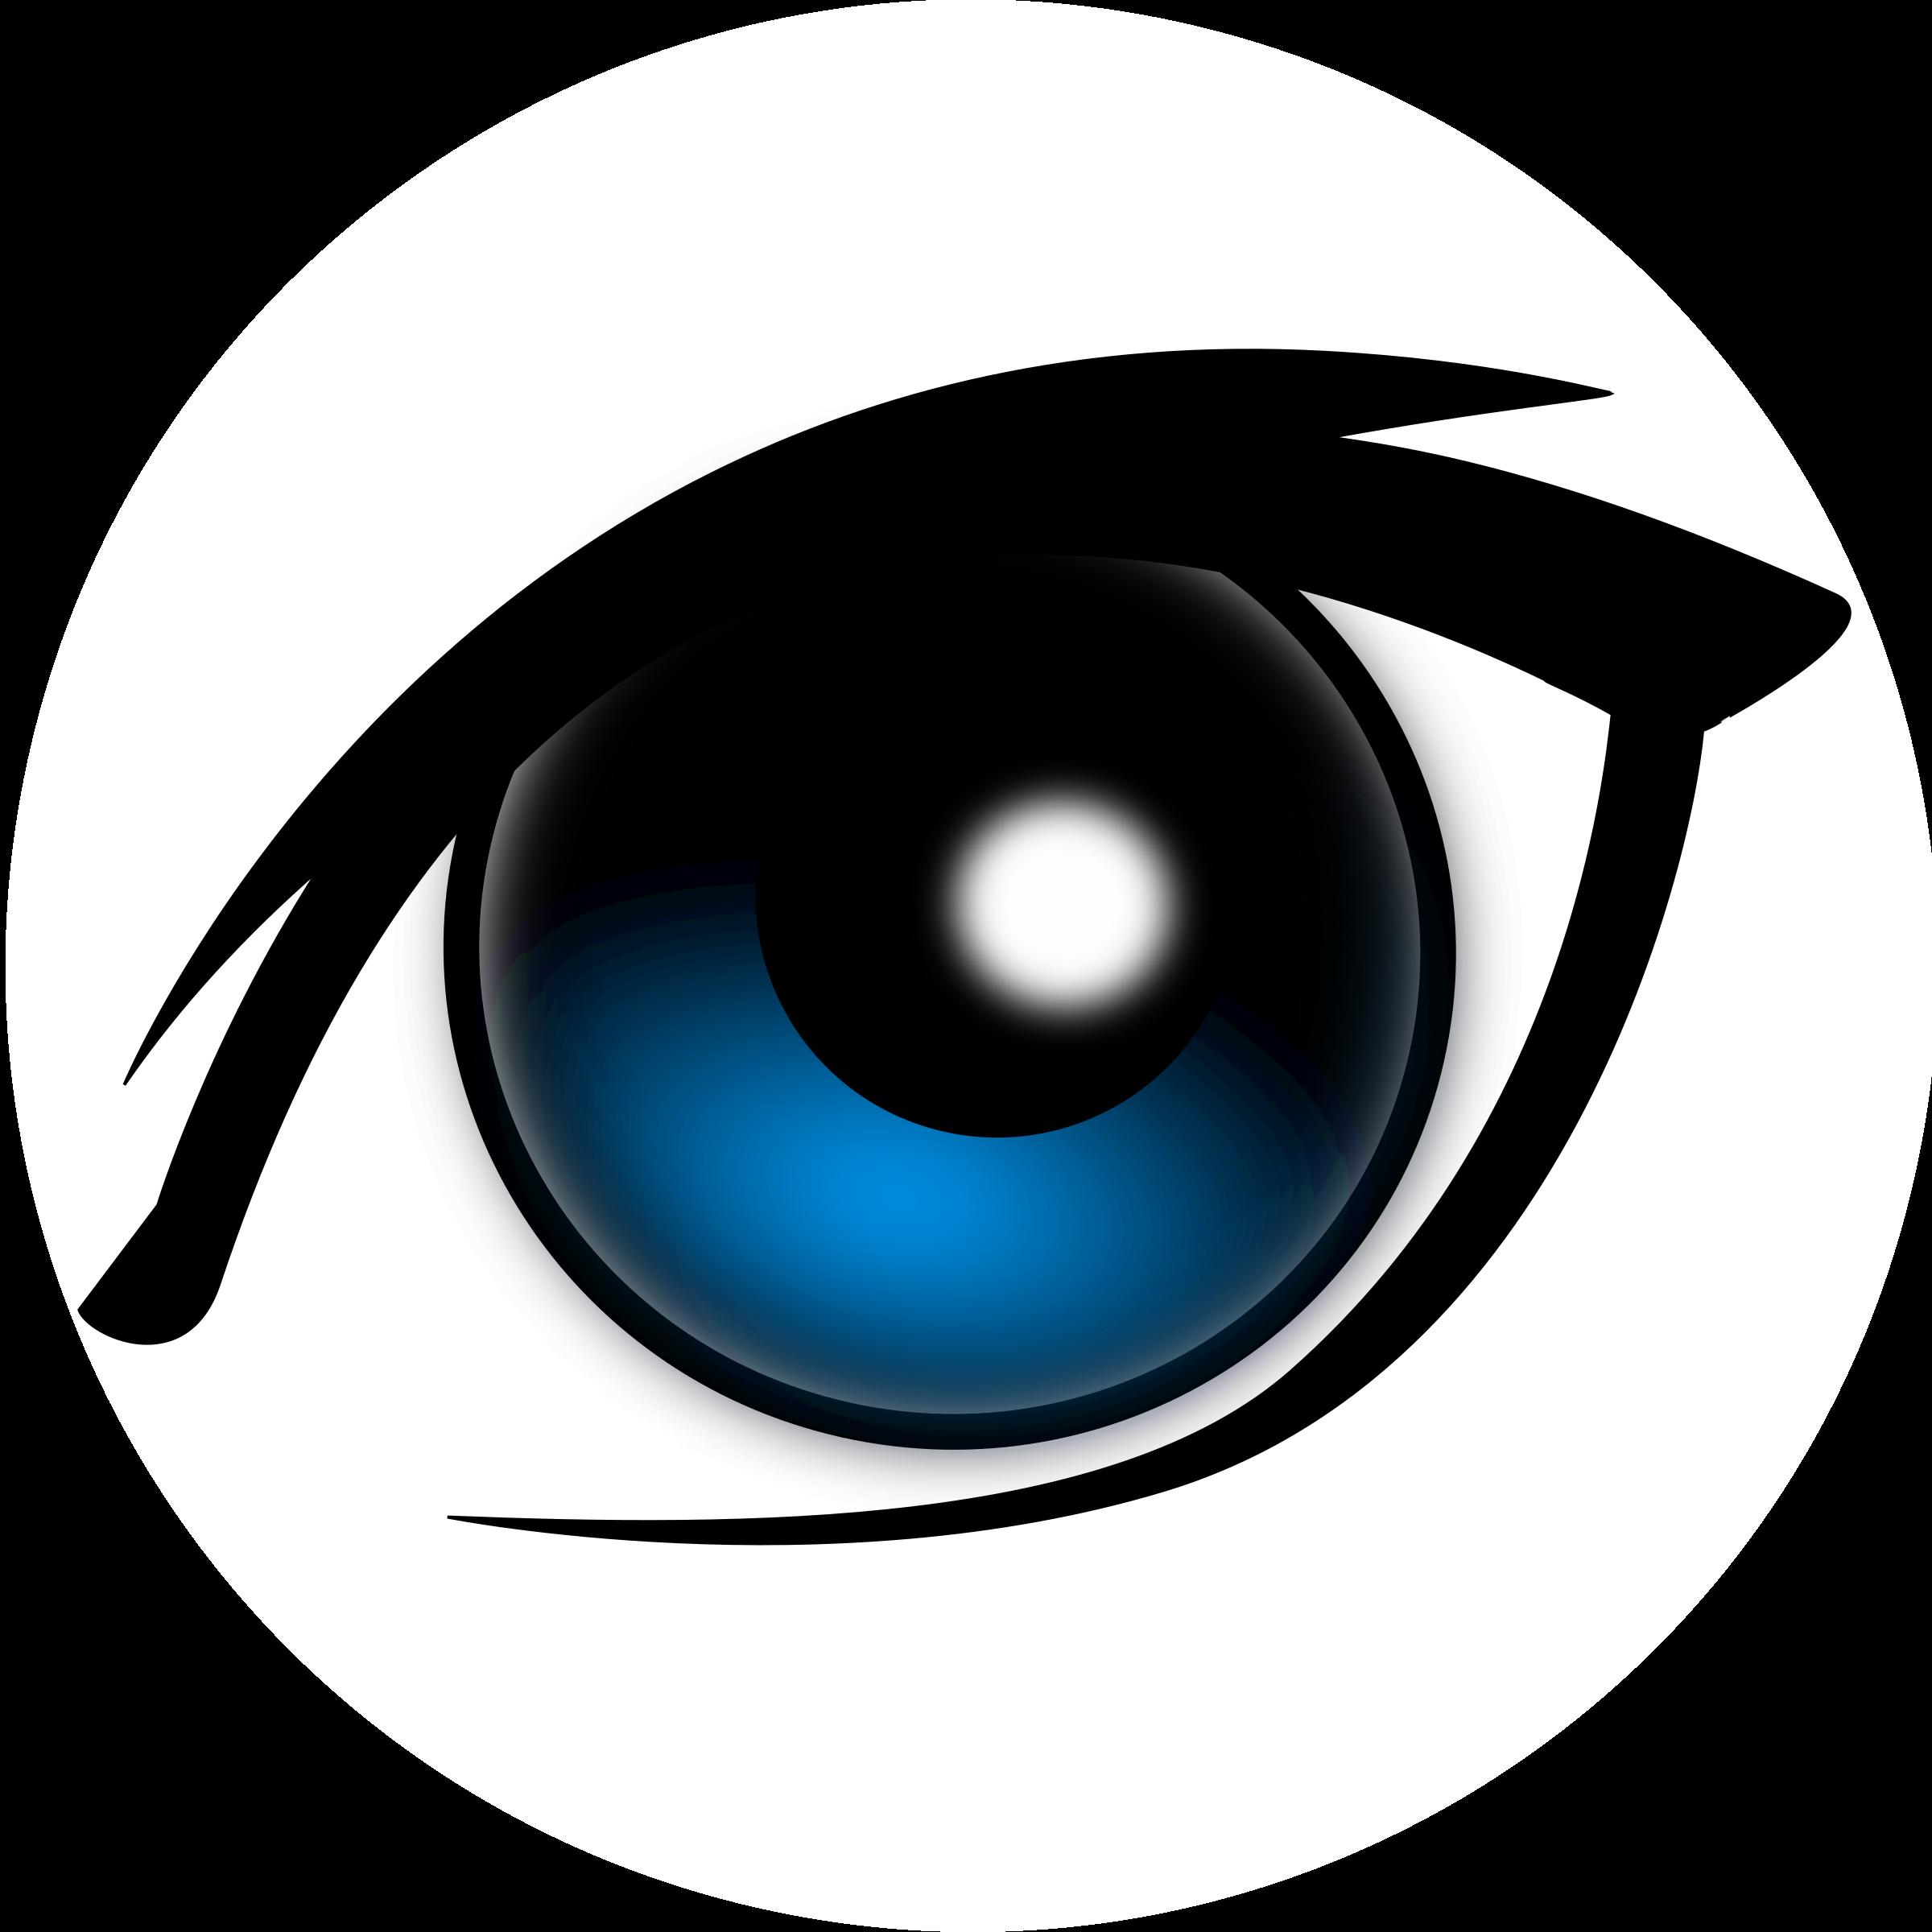 Cartoon icons png free. Eyeball clipart colorful eye